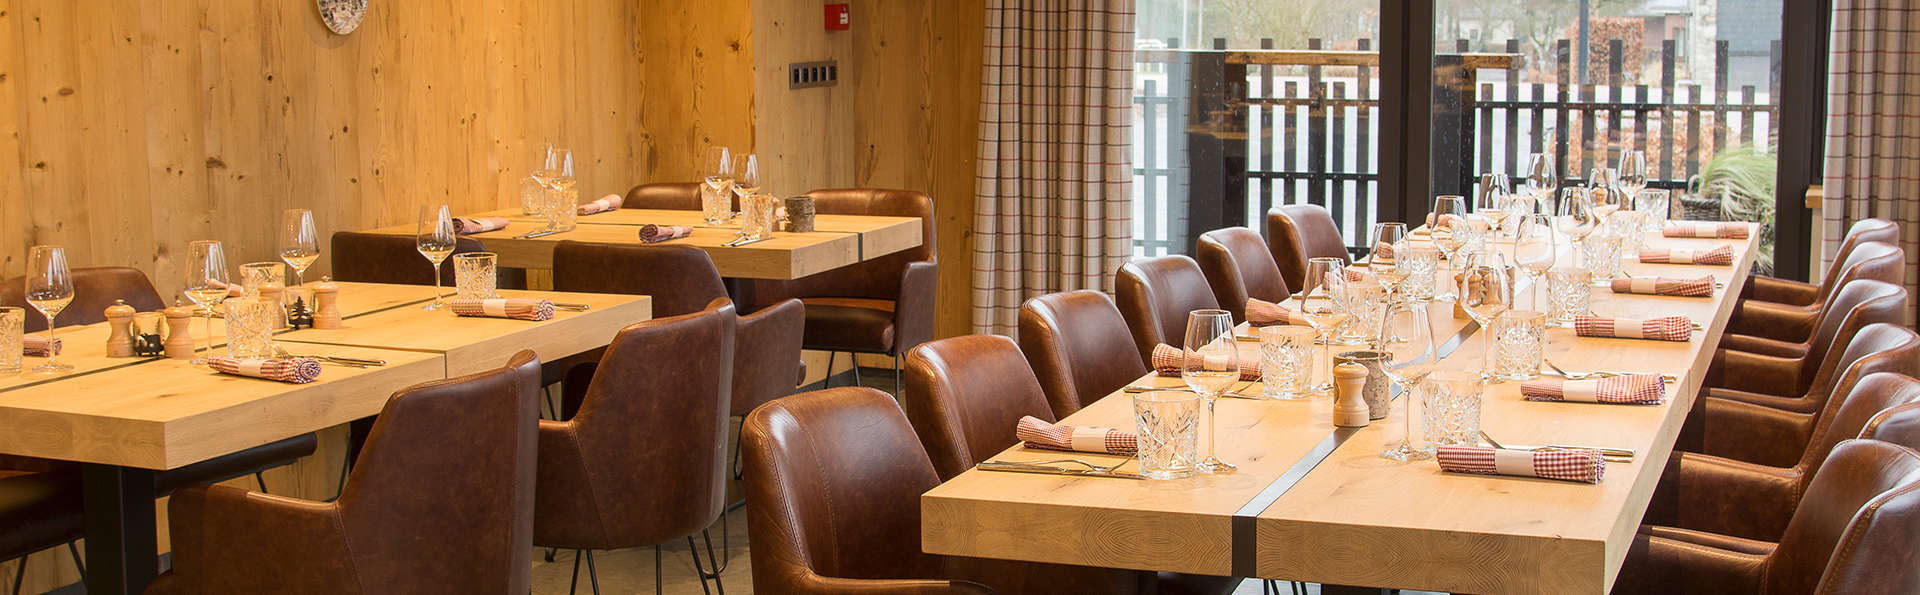 Au Cheval Blanc - Edit_Restaurant.jpg